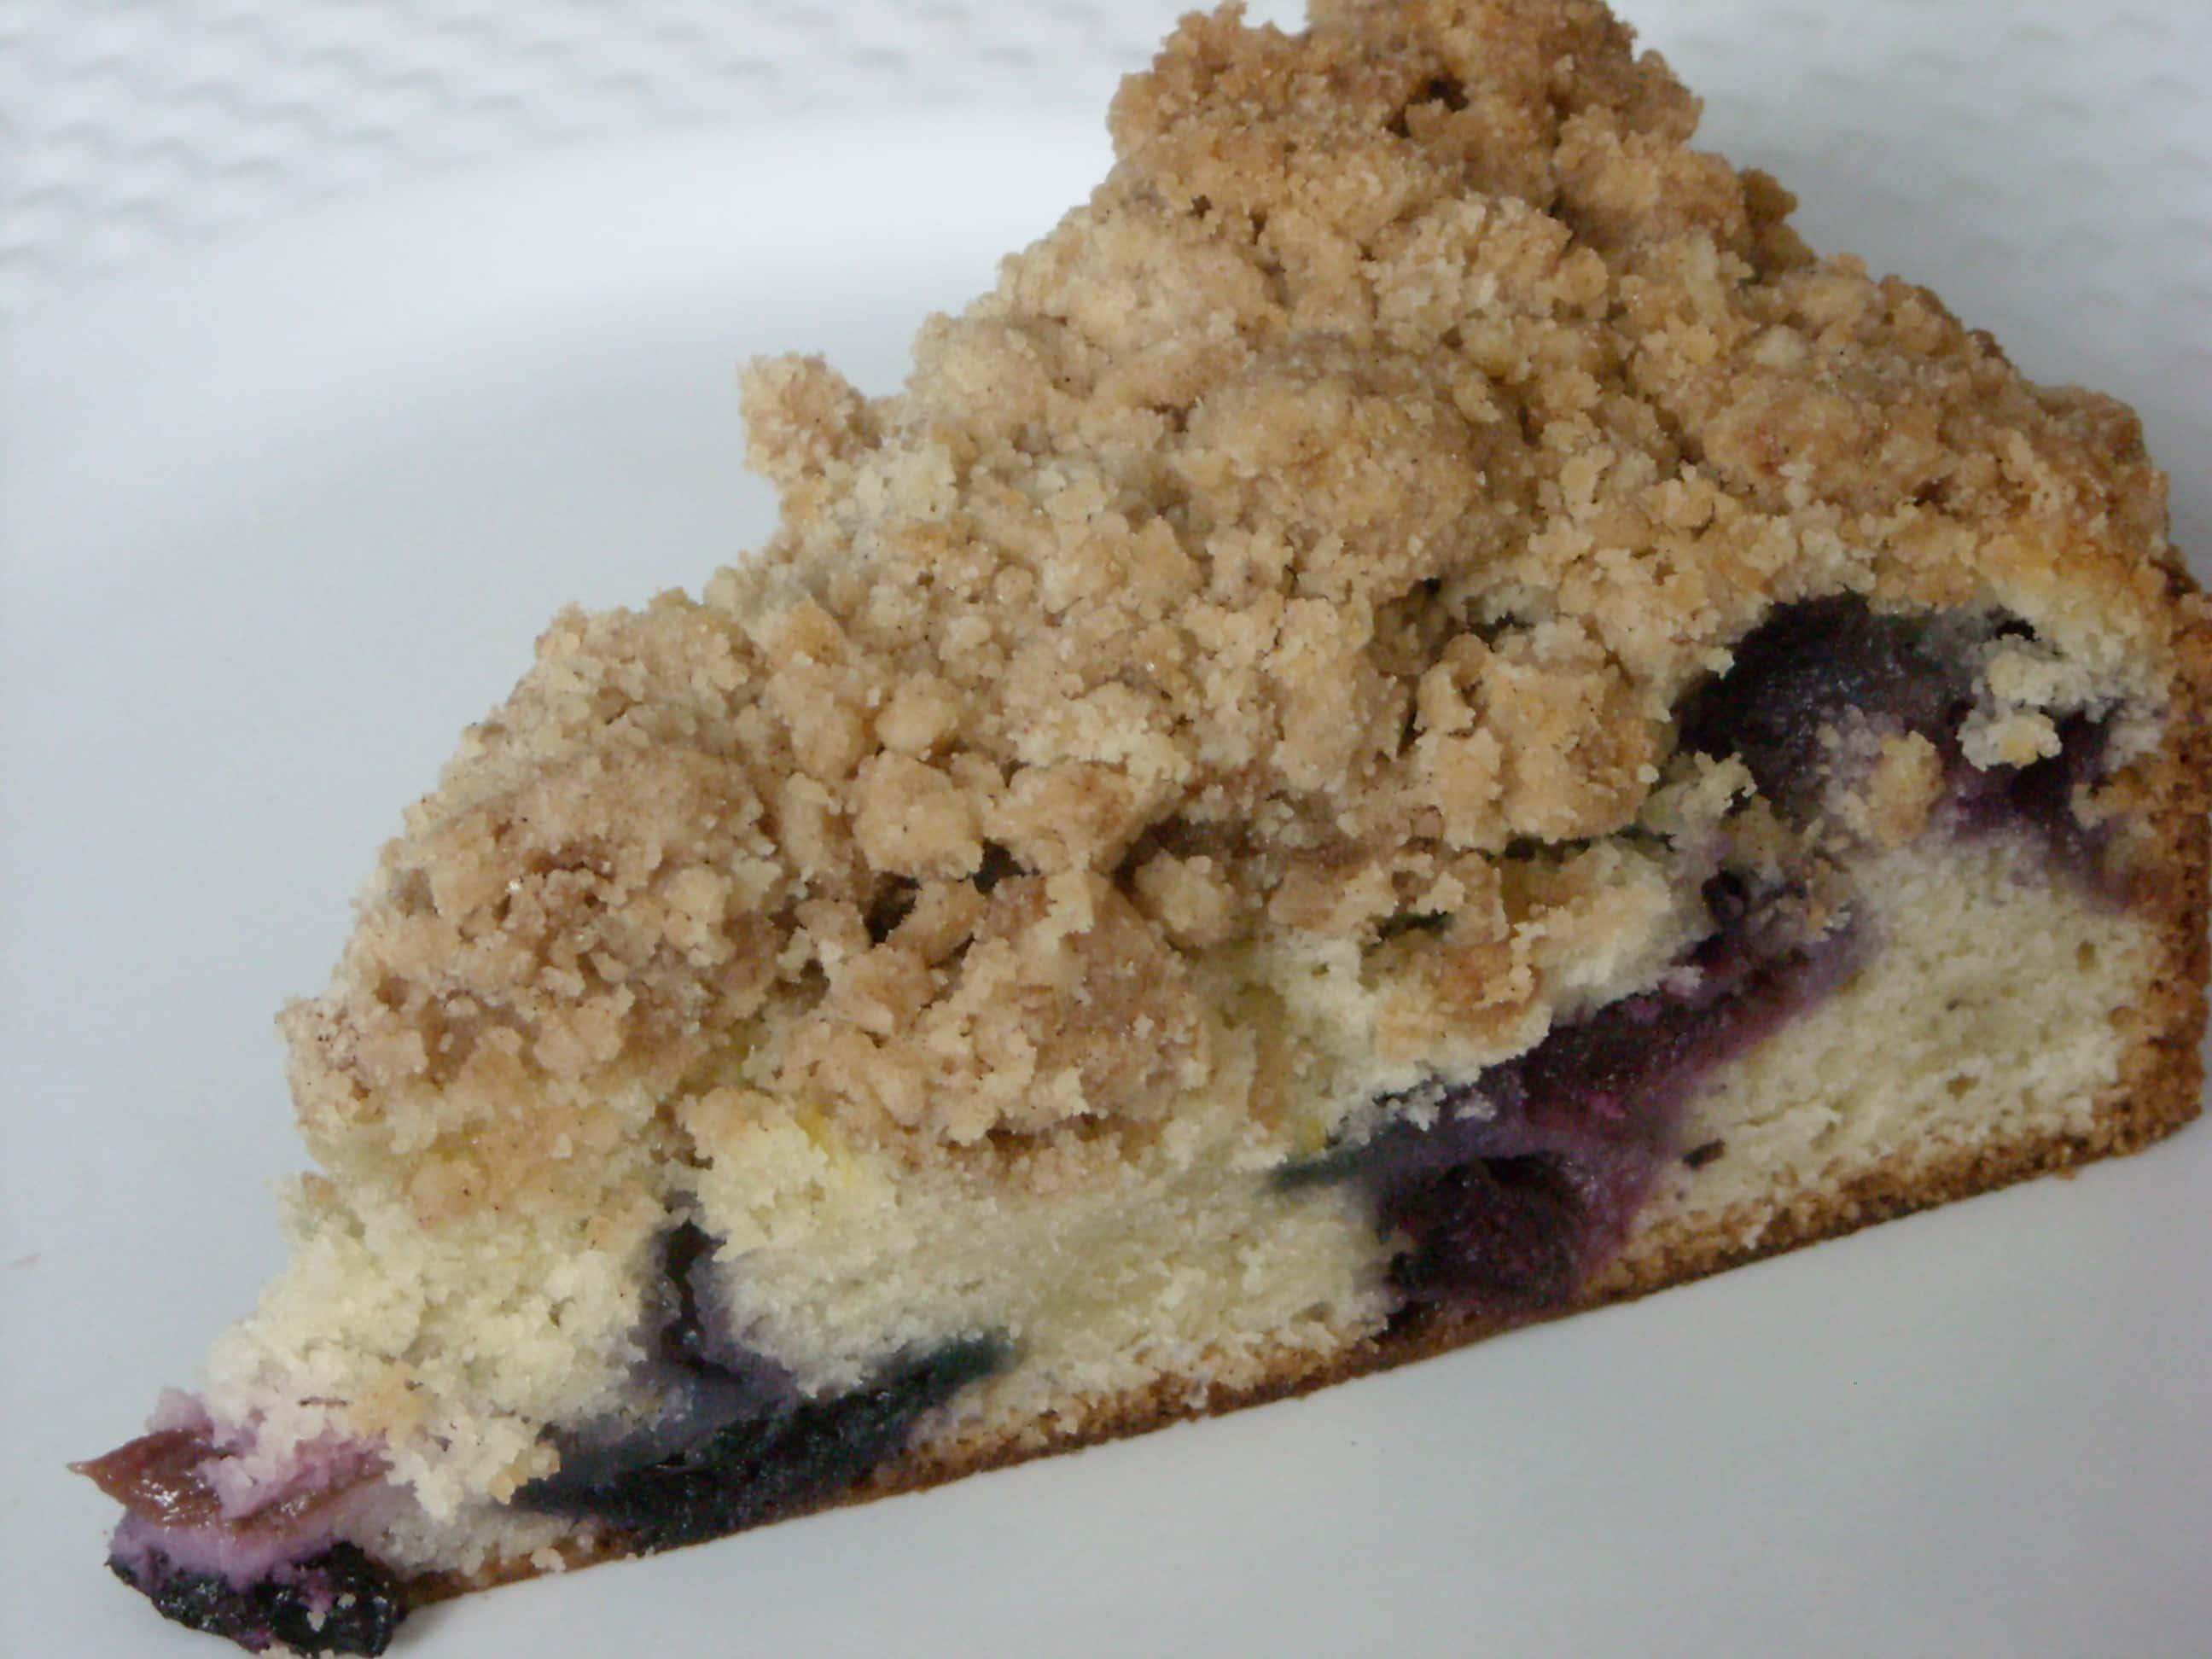 Blueberry Crumb Cake by Nutmeg Nanny